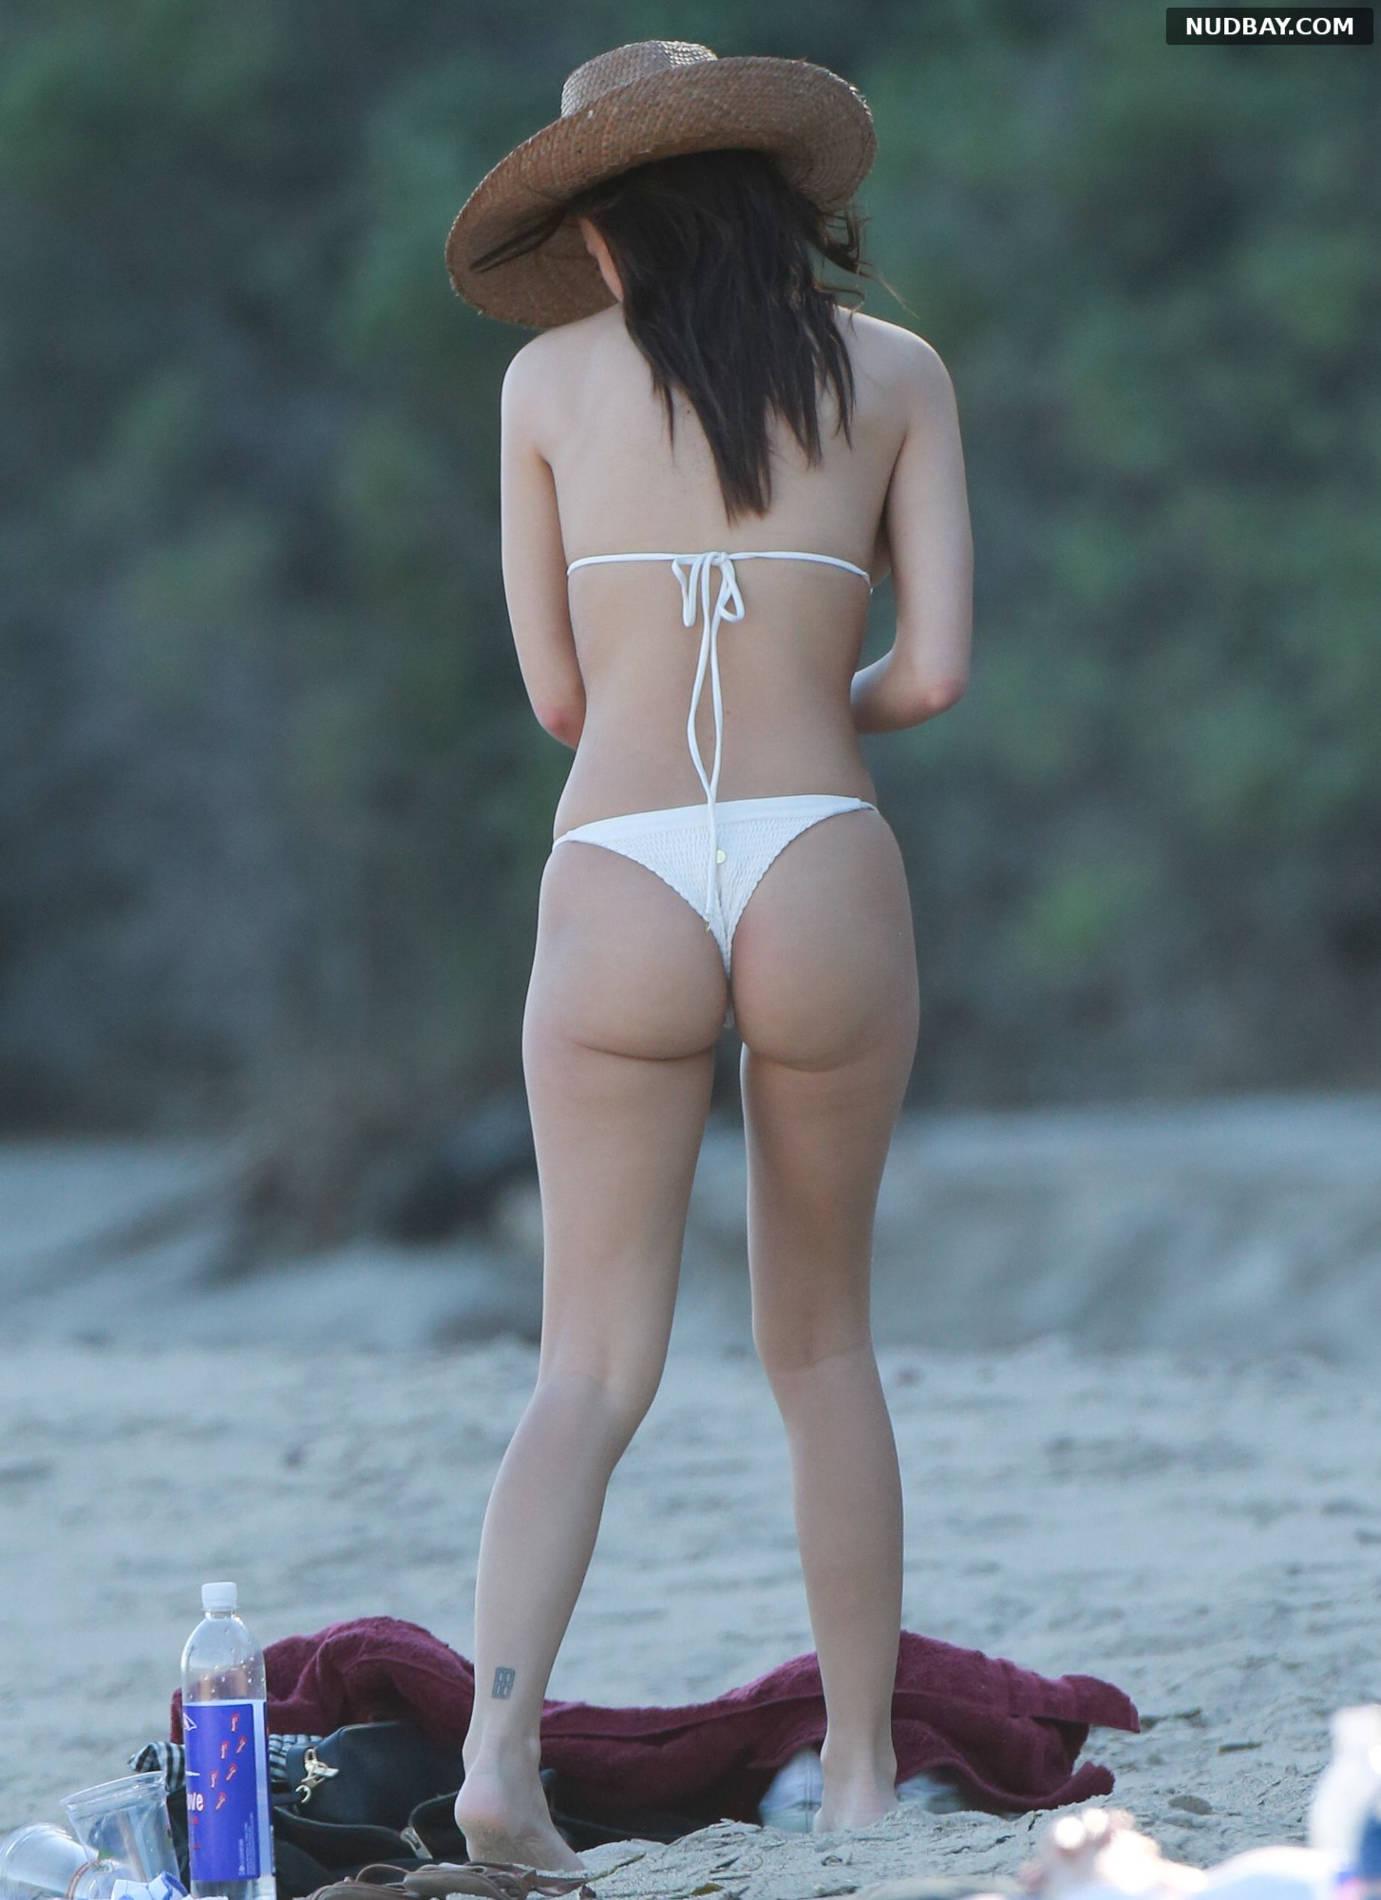 Emily Ratajkowski At a photoshoot on the beach in Malibu Mar 09 2017